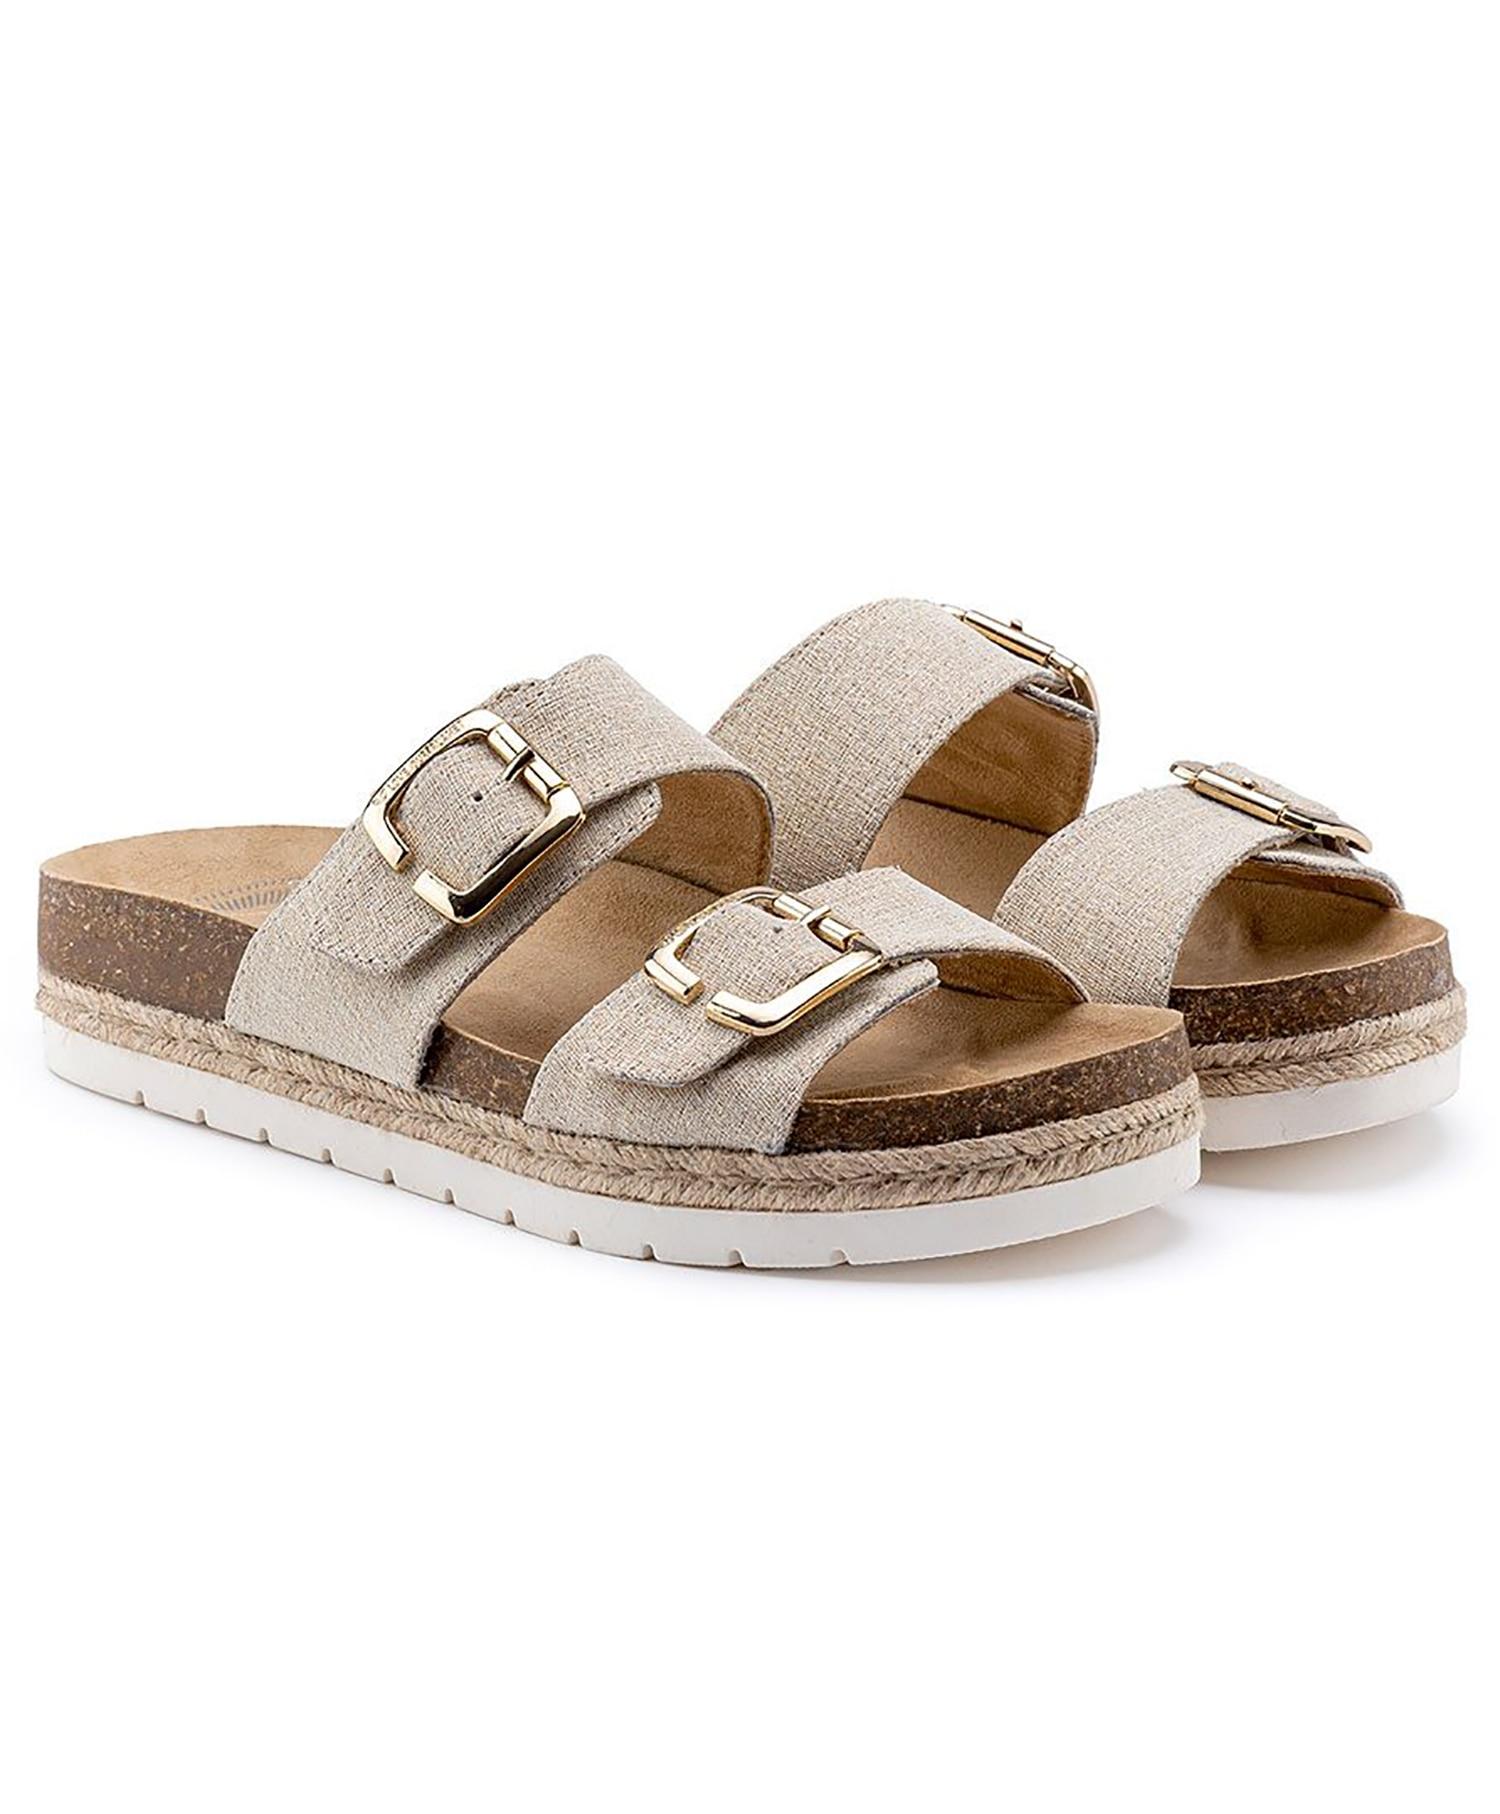 Love Our Planet sandal